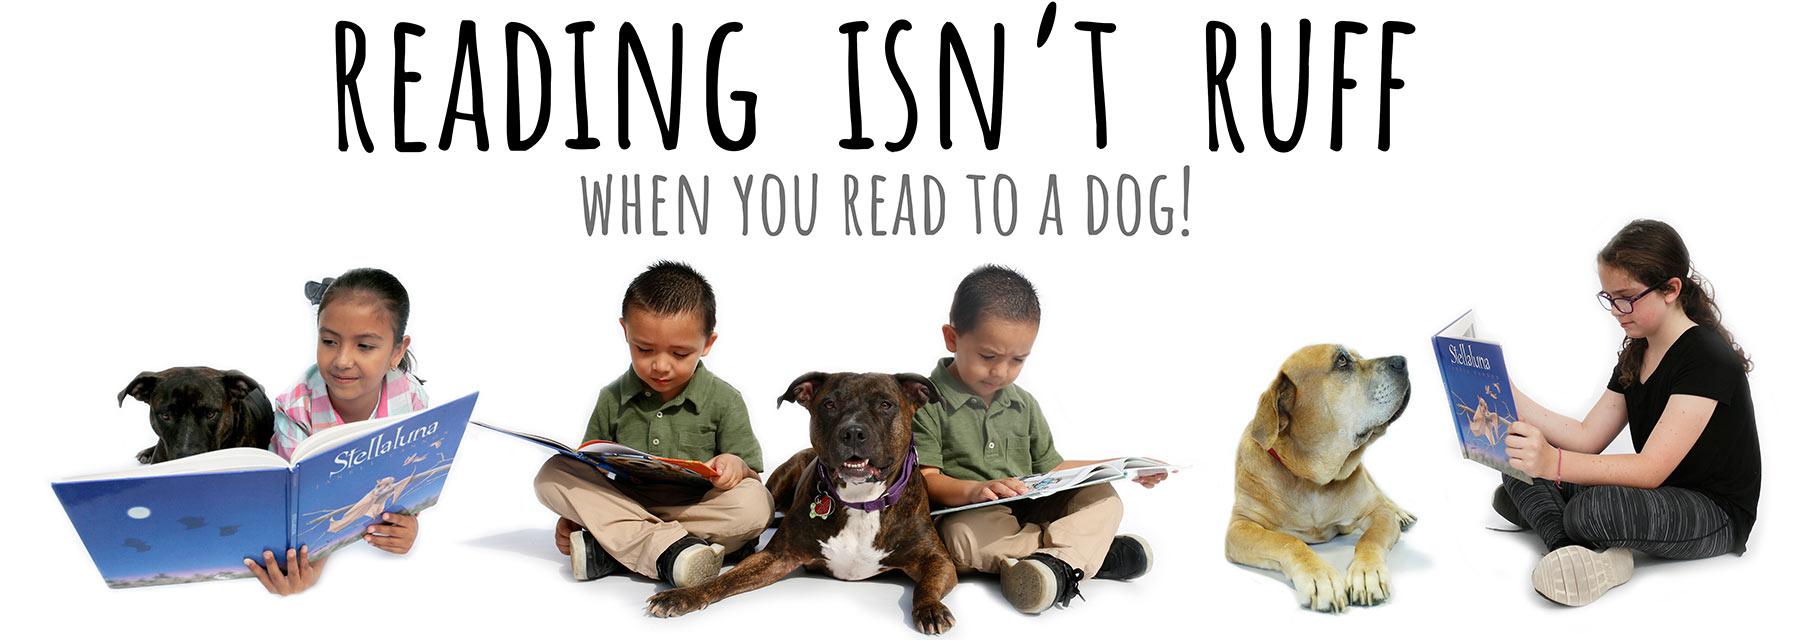 Reading Isn't Ruff